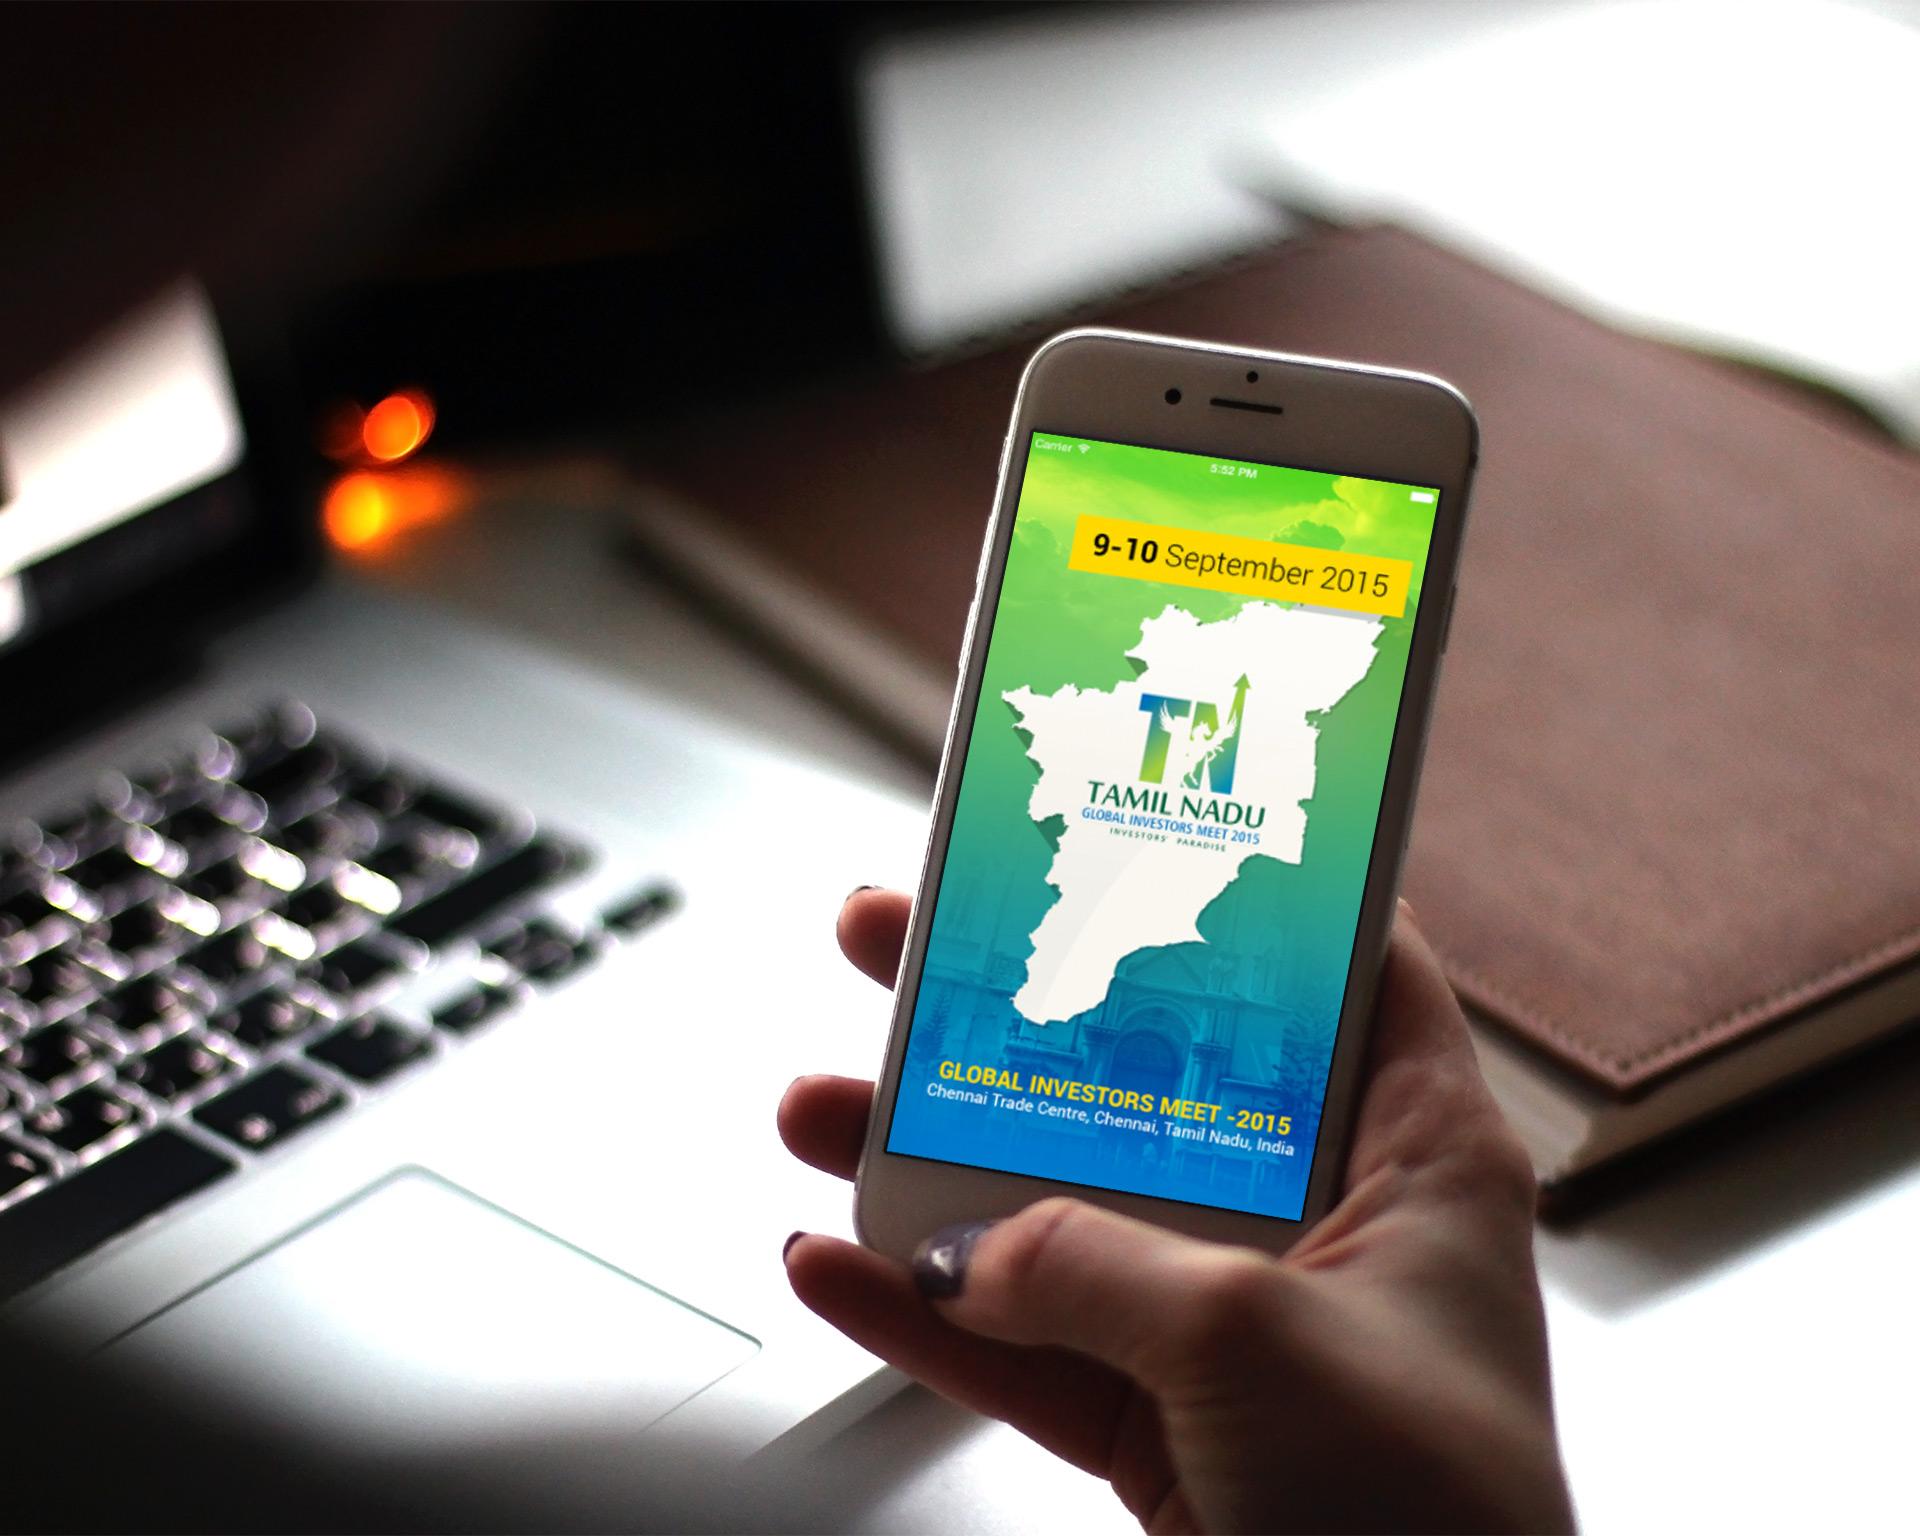 tamil nadu dating apps Download tamil nadu board result 2018 for pc  dating education entertainment  google play statistics for tamil nadu board result 2018 & similar apps app .